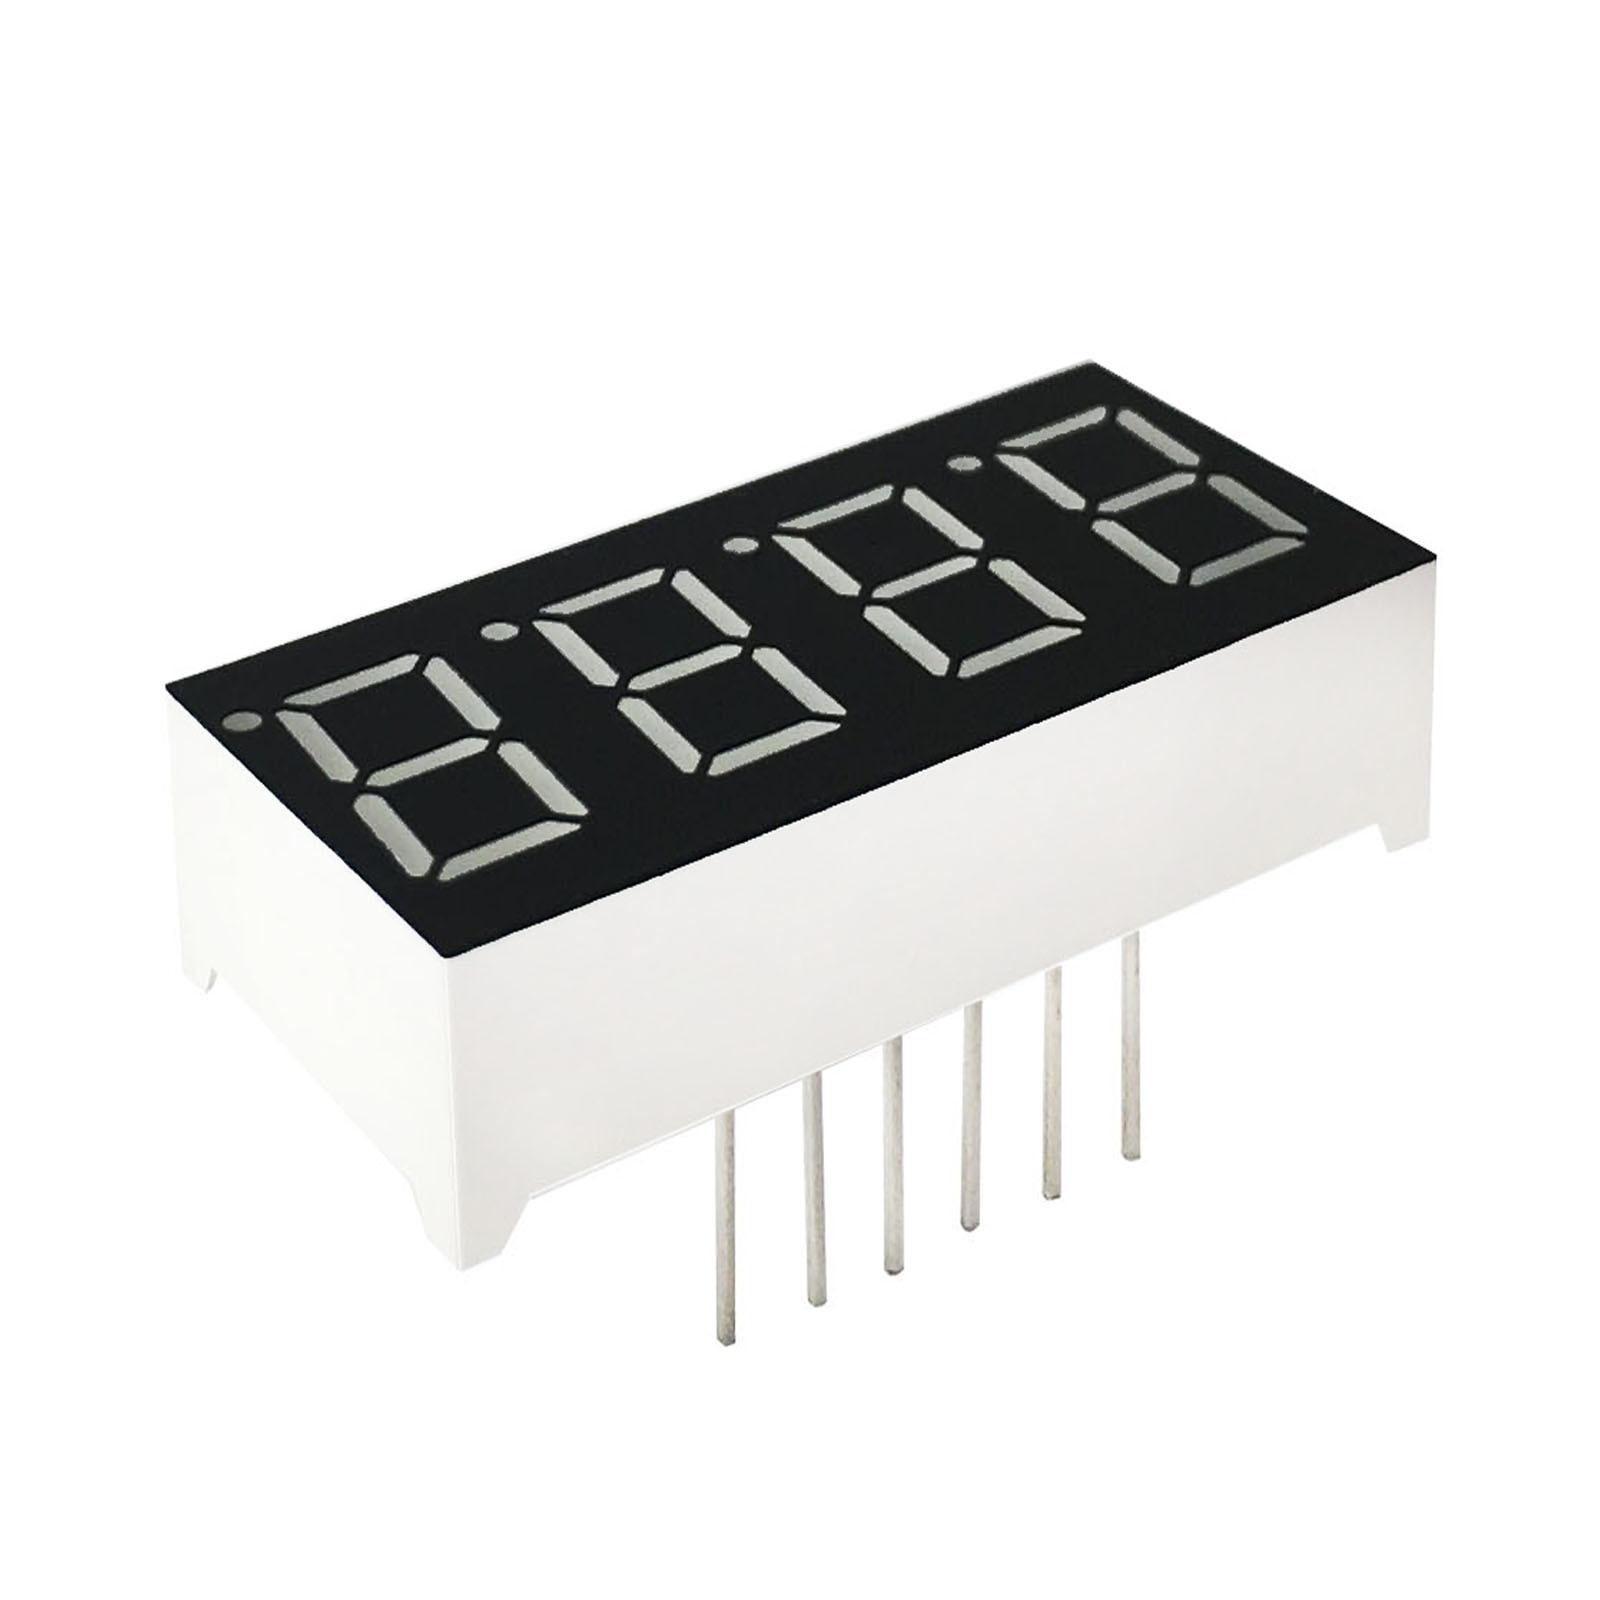 MCIGICM 10pcs 7 Segment Common Cathode 4 Bit Digital Tube 0.36